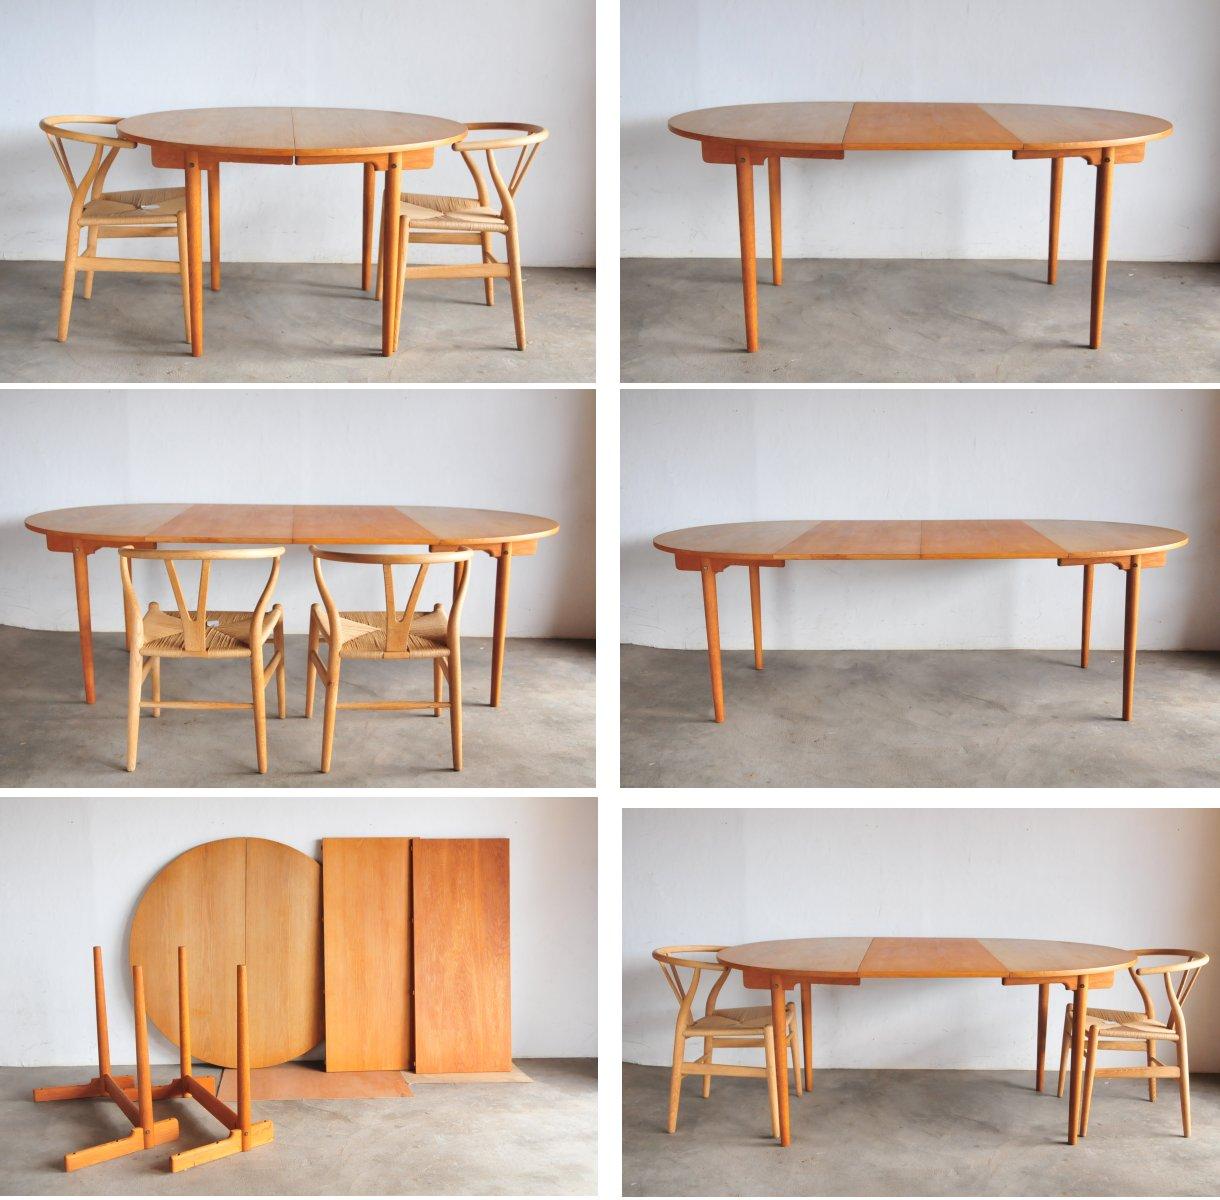 Hans J Wegner Oak Dining Table Denmark AT 329ウェグナーオークダイニングテーブル